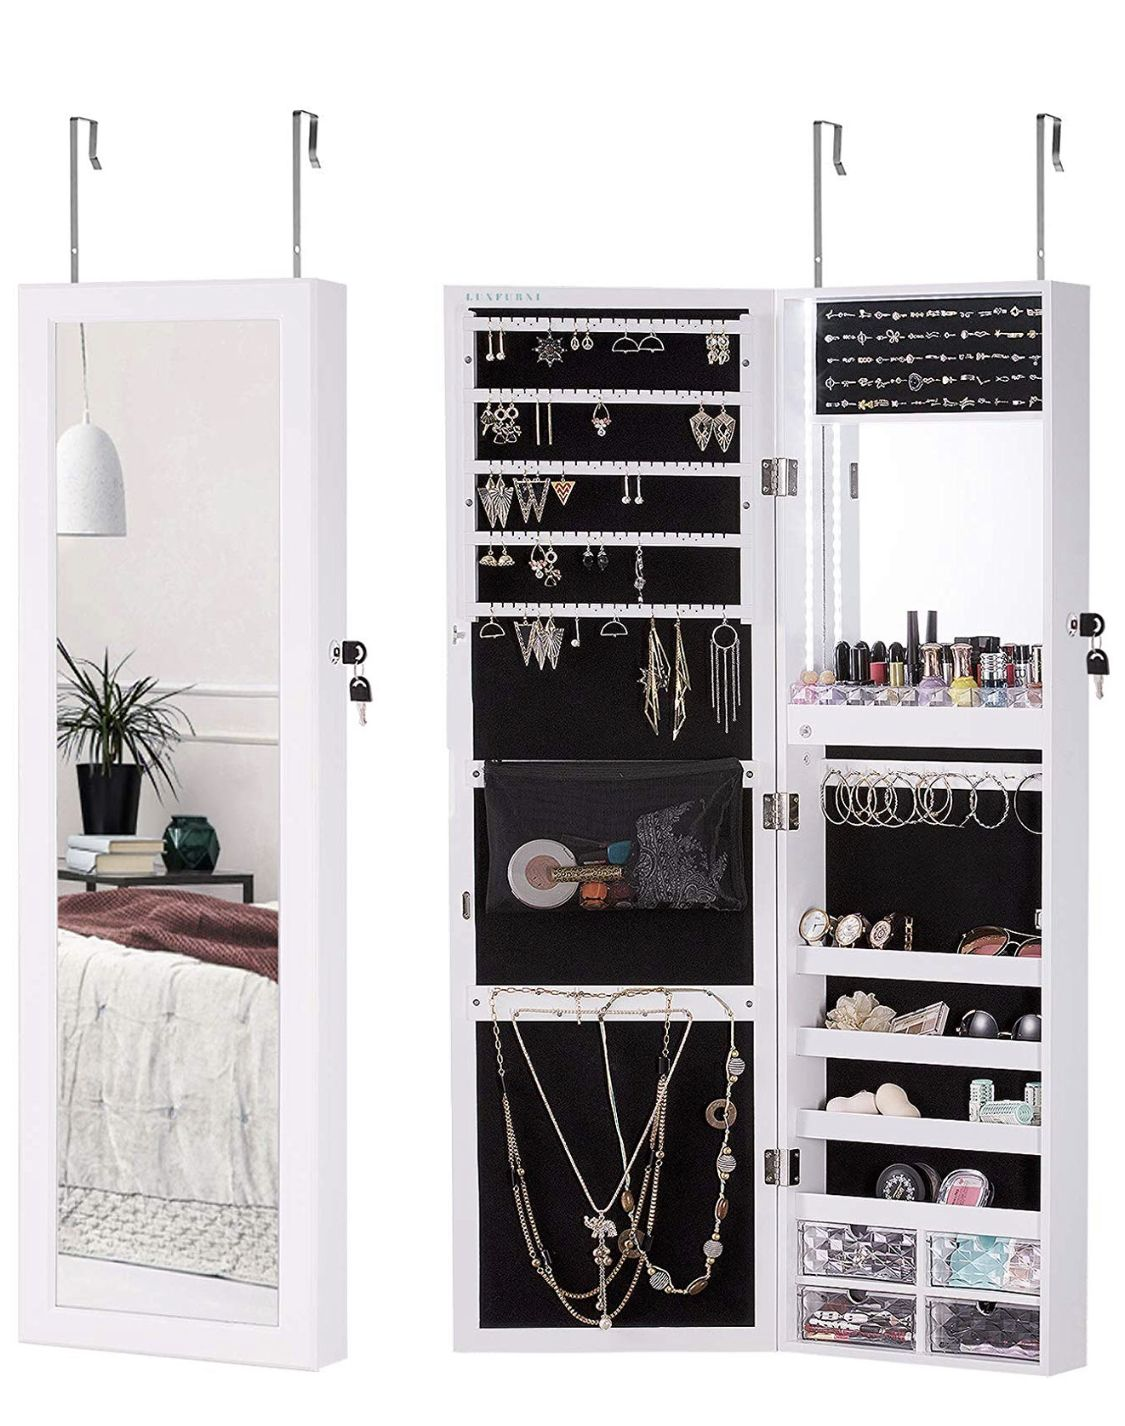 Luxfurni Led Light Jewelry Cabinet Wall Mount Door Hanging Mirror Makeup Lockable Https W Hanging Mirror Mirror Jewelry Storage Wall Mirrors With Storage